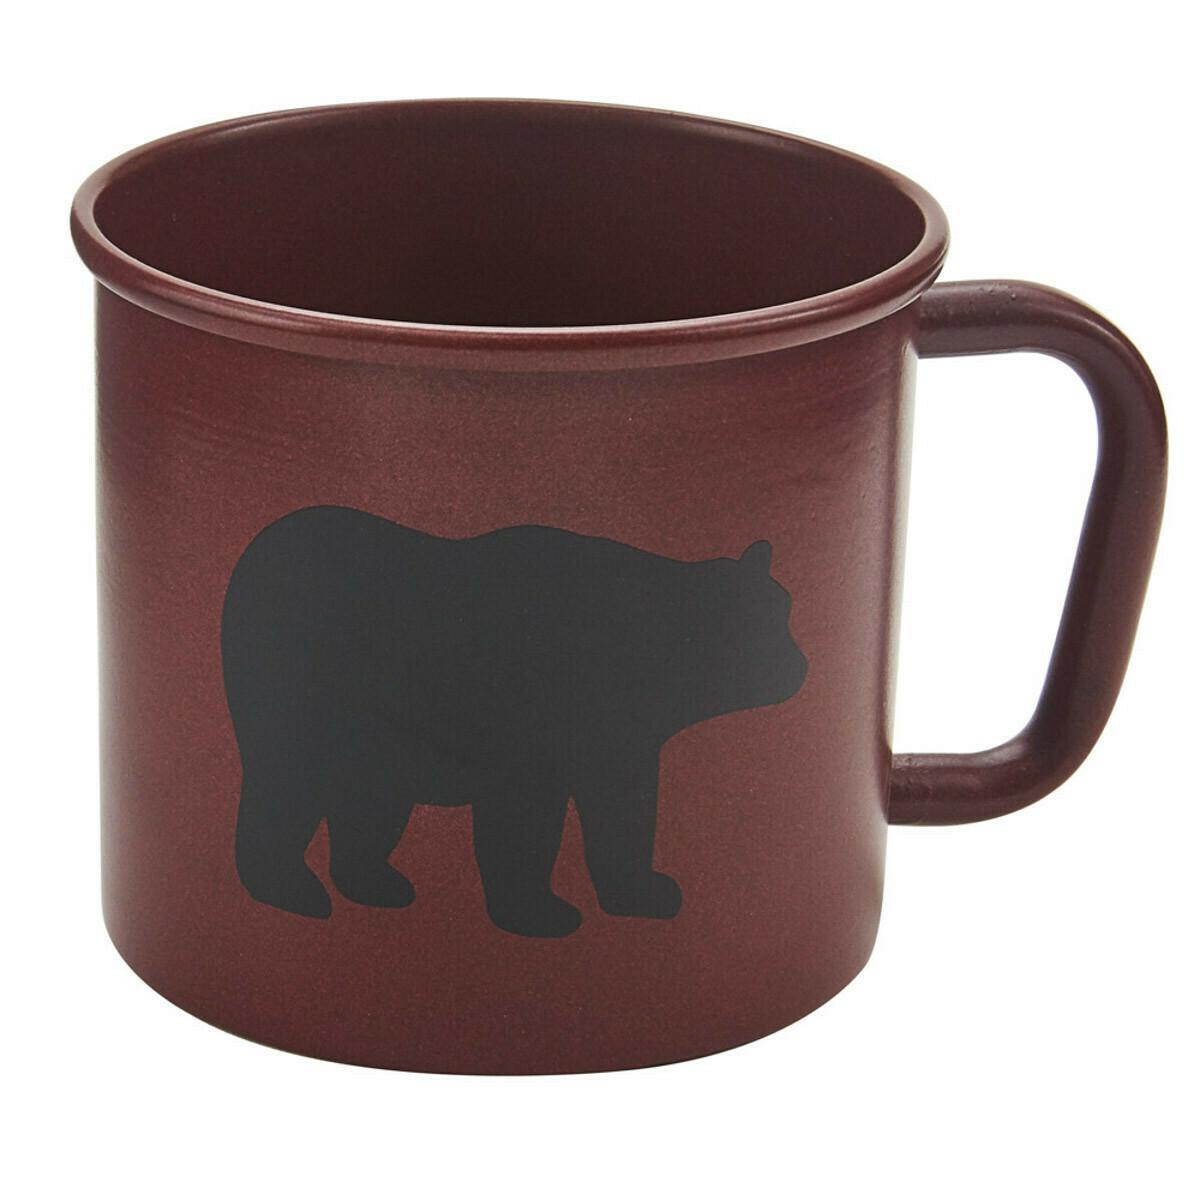 Linville Red Bear Enamel Mug